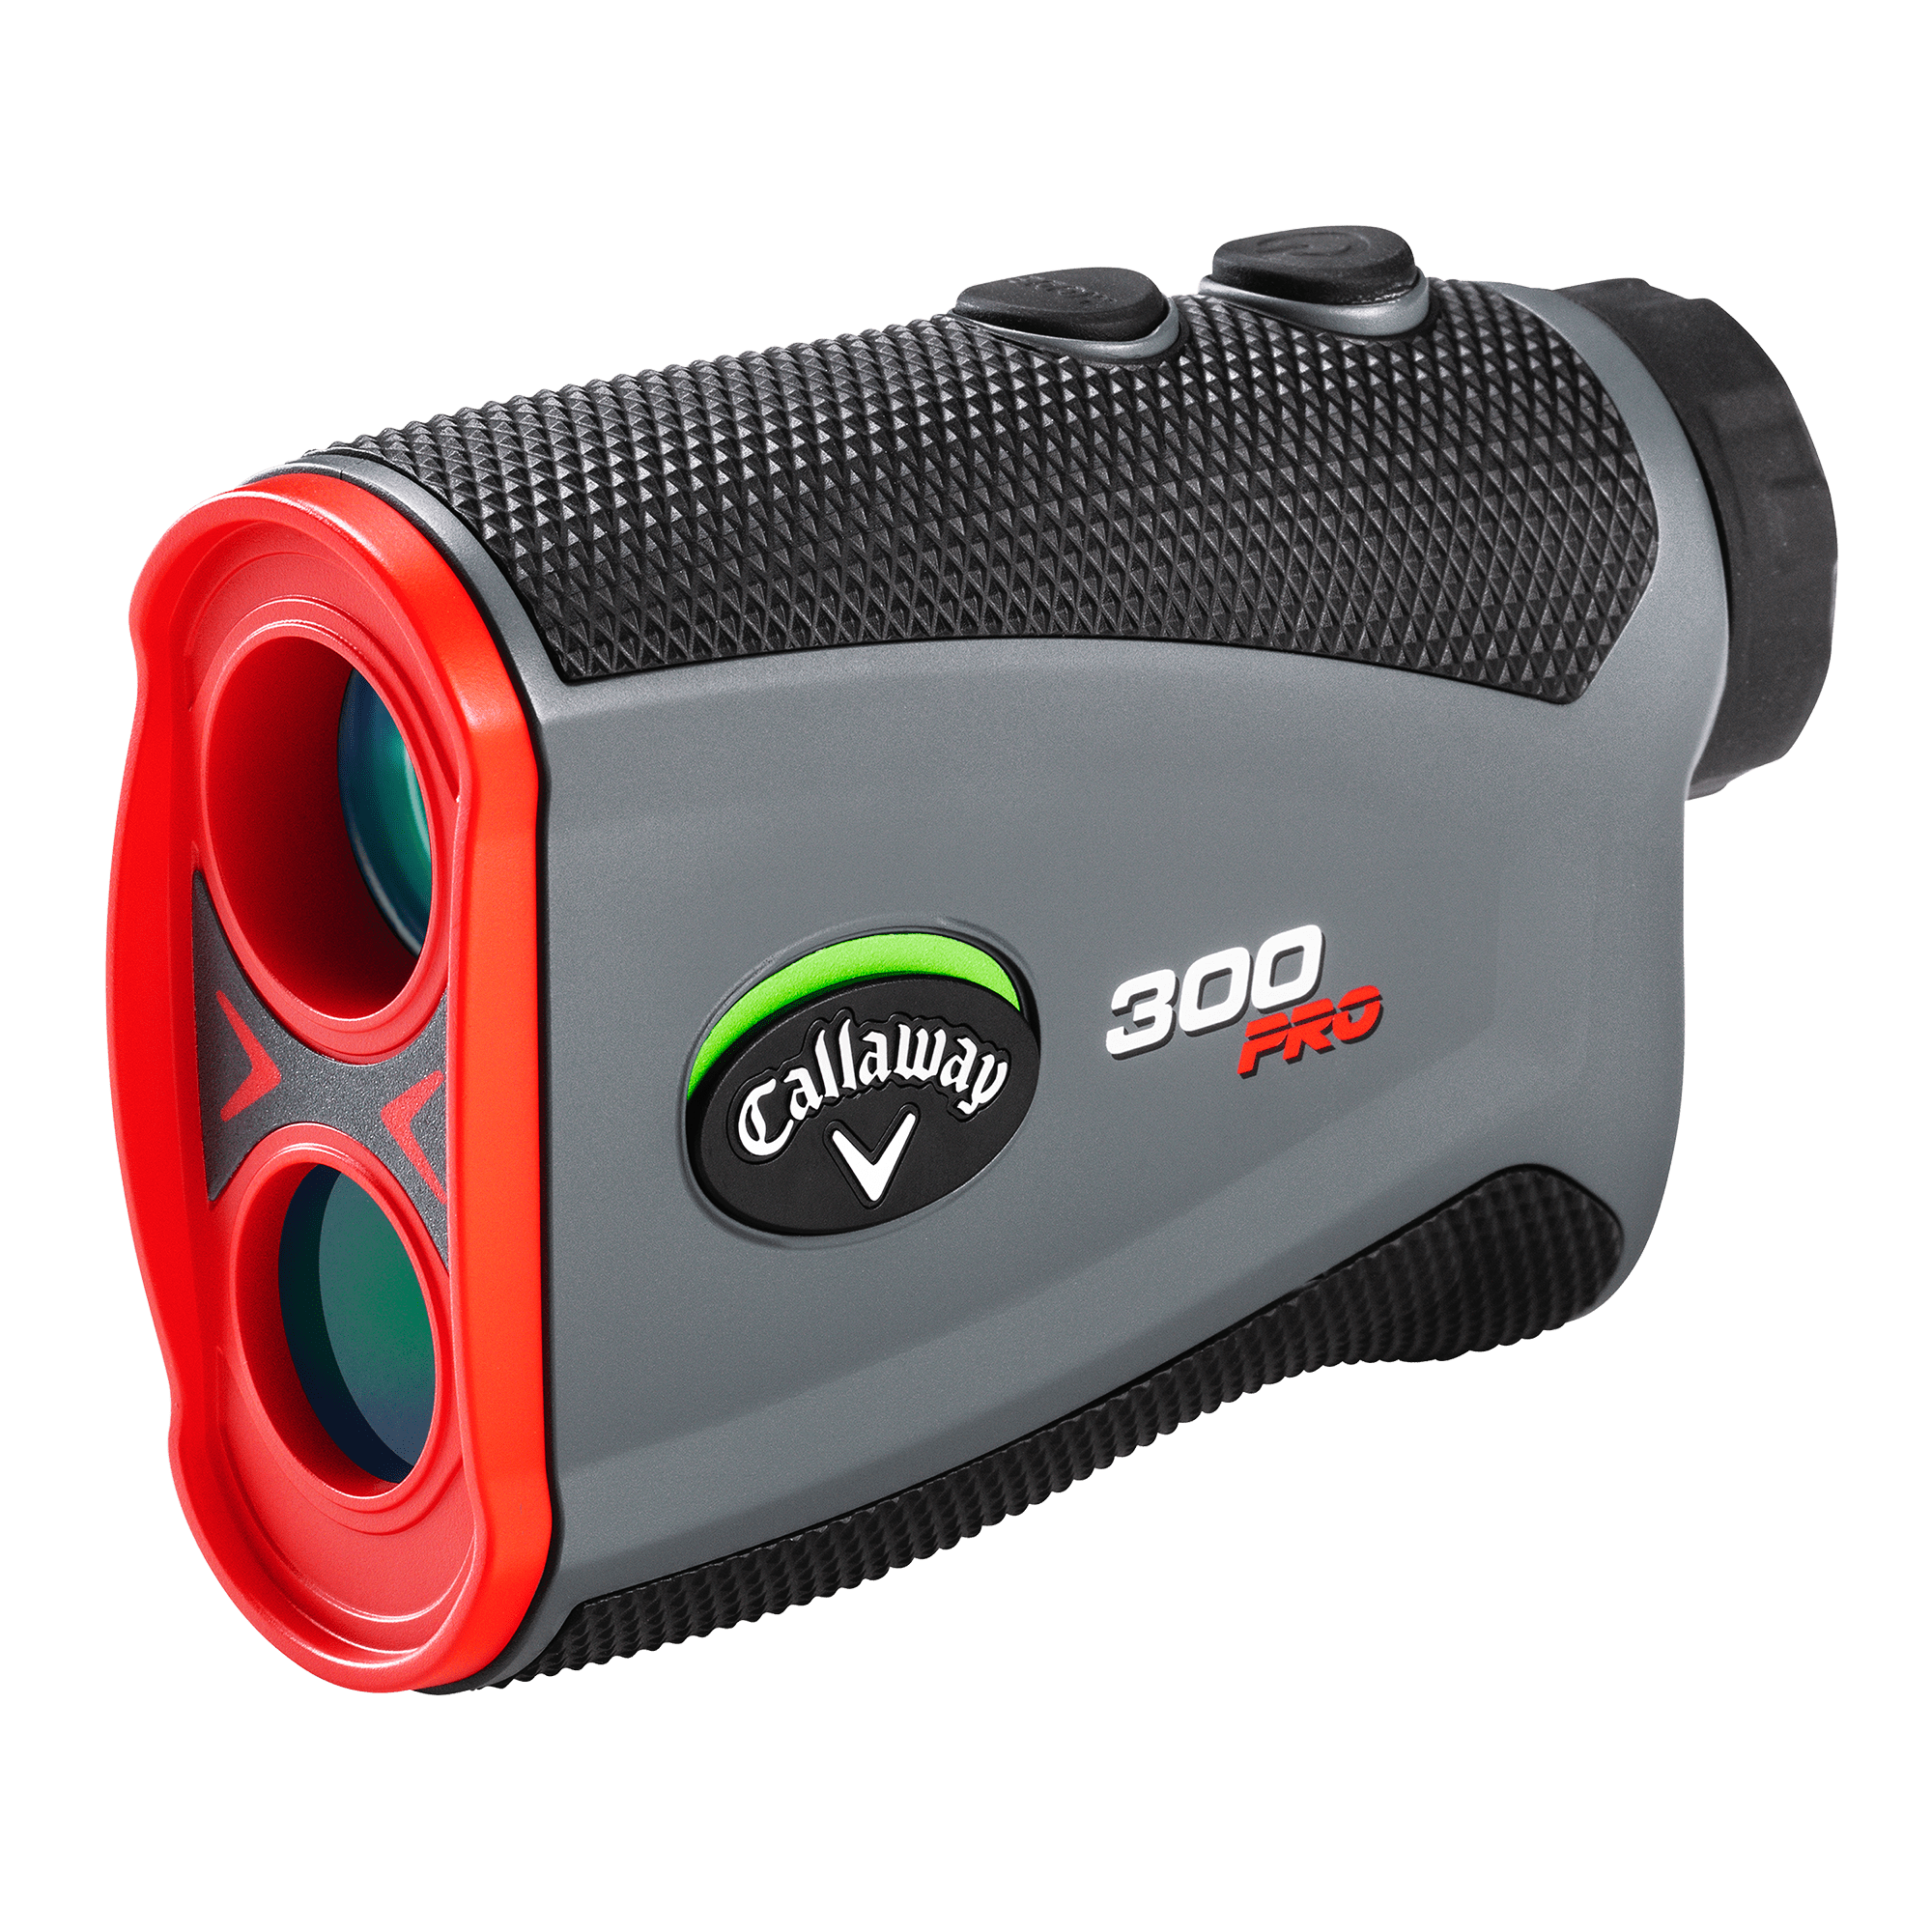 Callaway Golf 300 Pro Laser Rangefinder  - Callaway Golf GPS